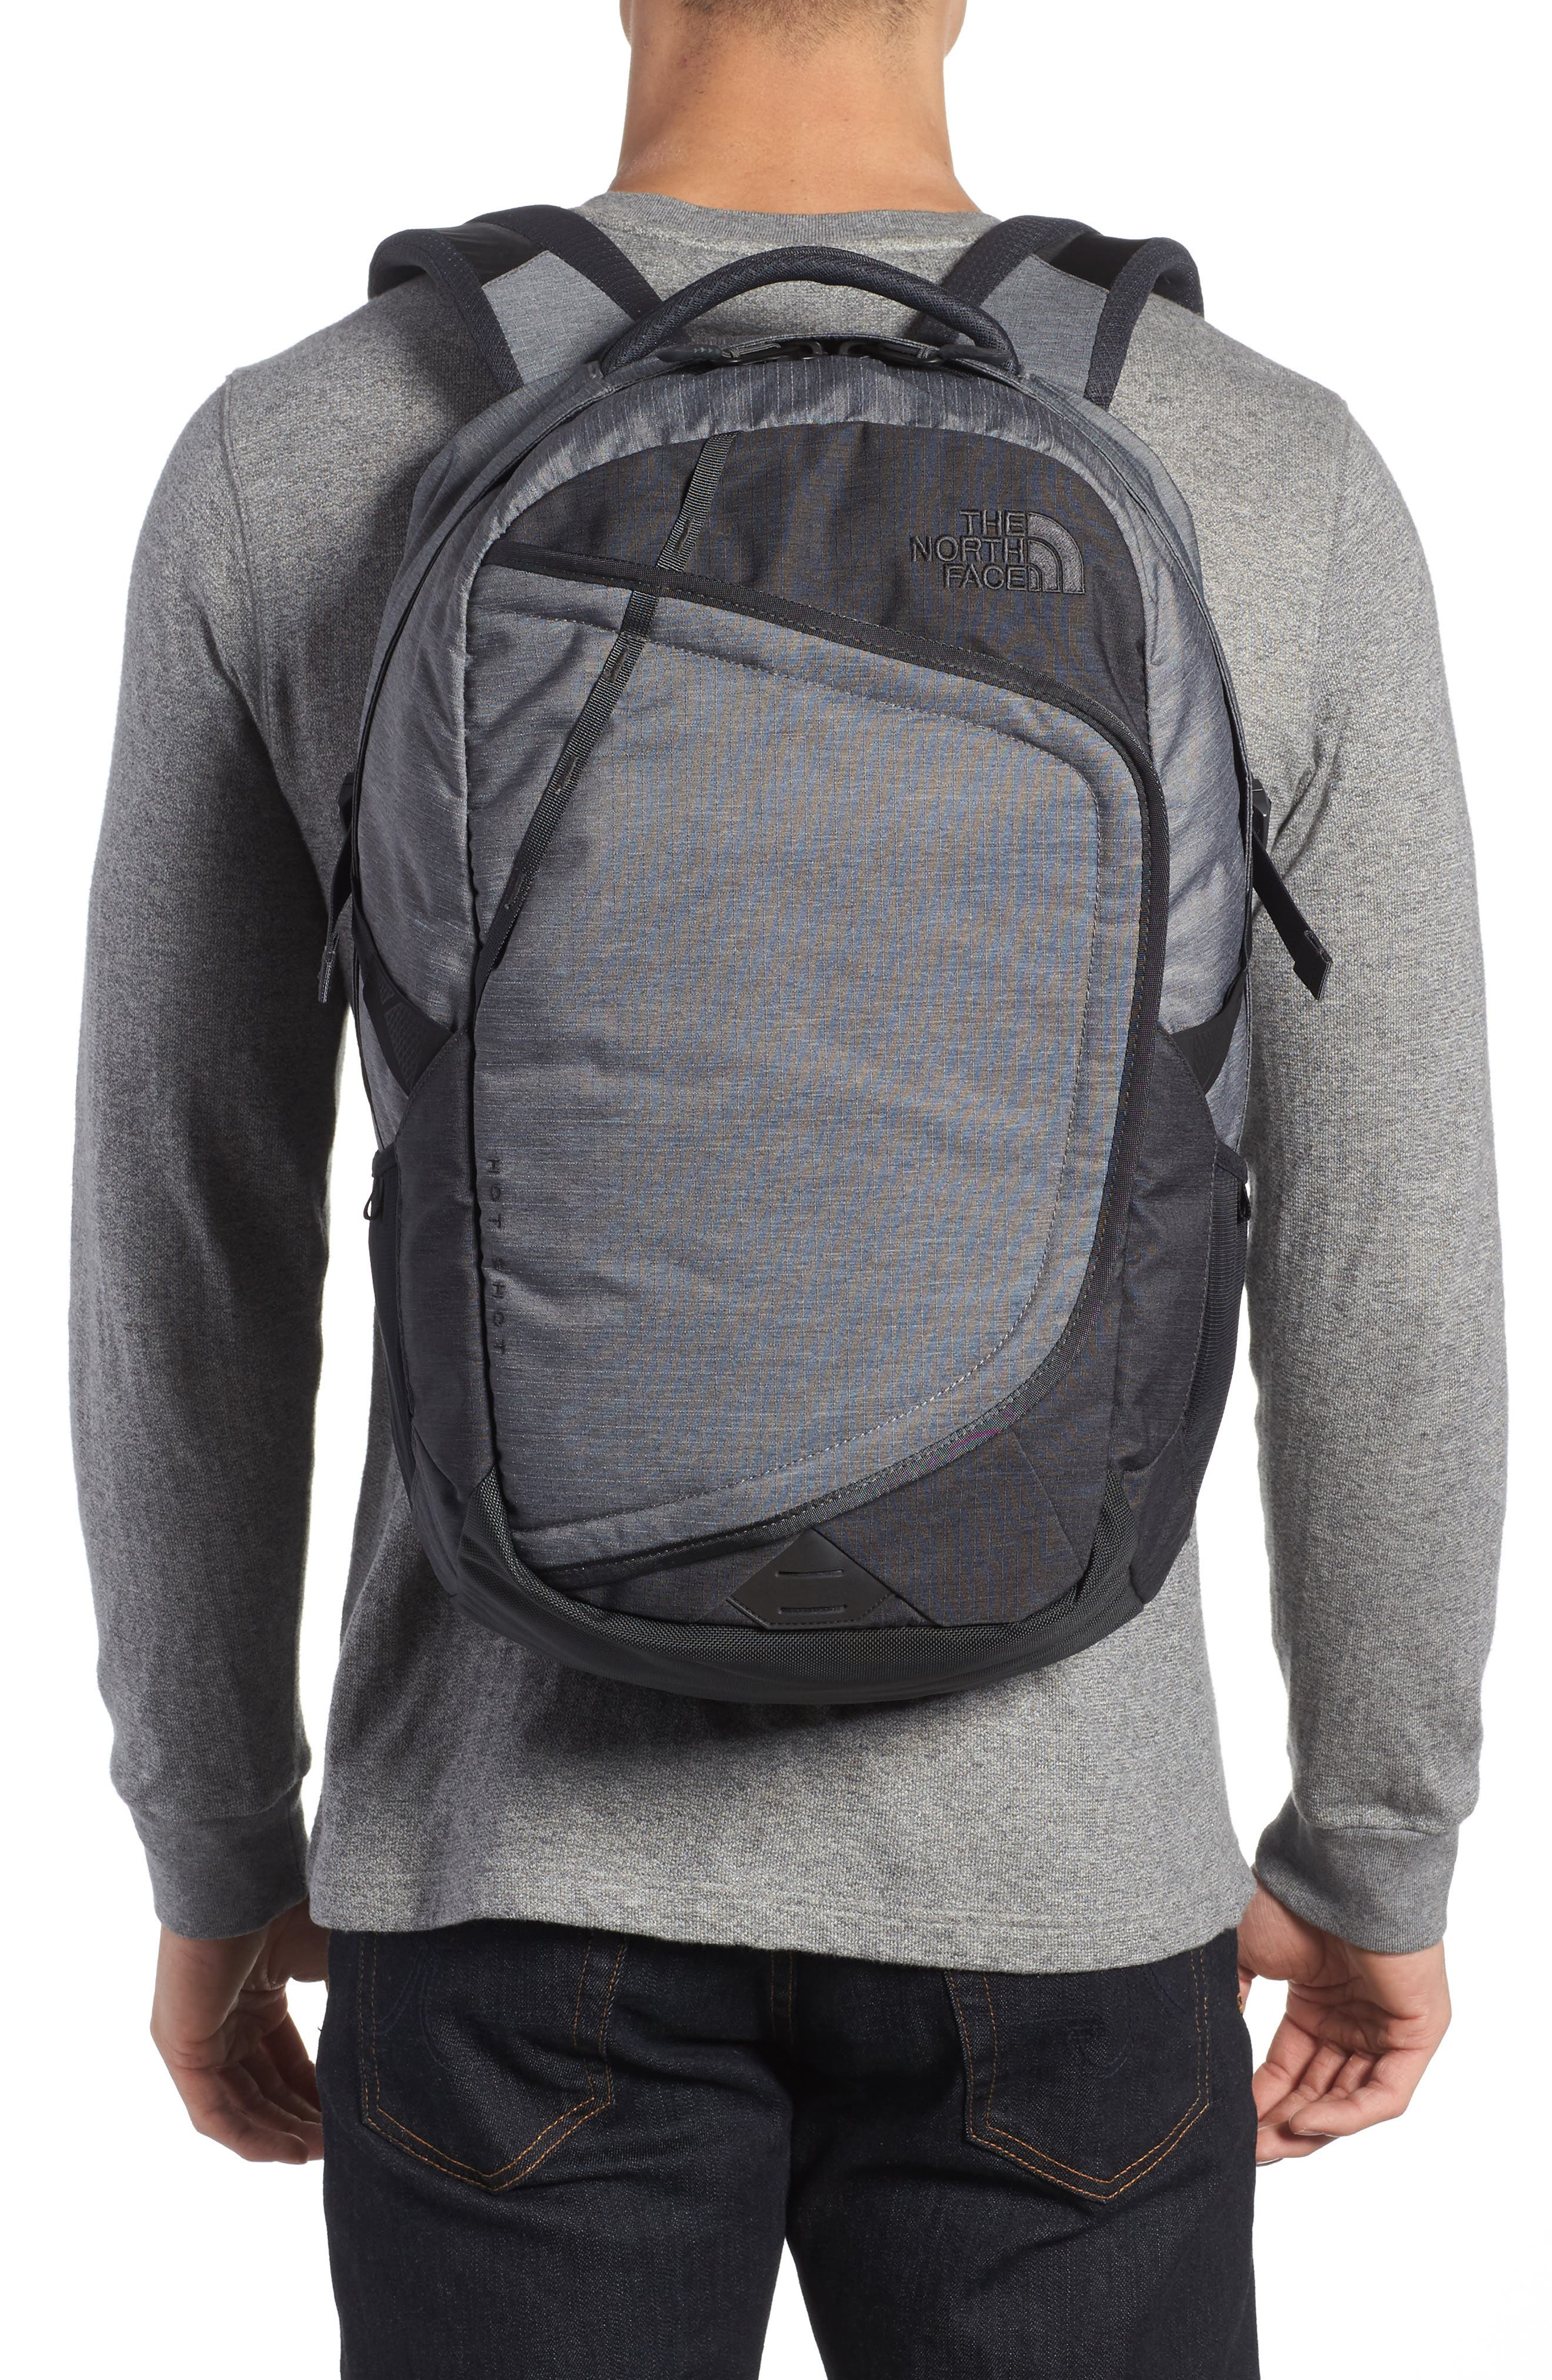 Hot Shot Backpack,                             Alternate thumbnail 2, color,                             021